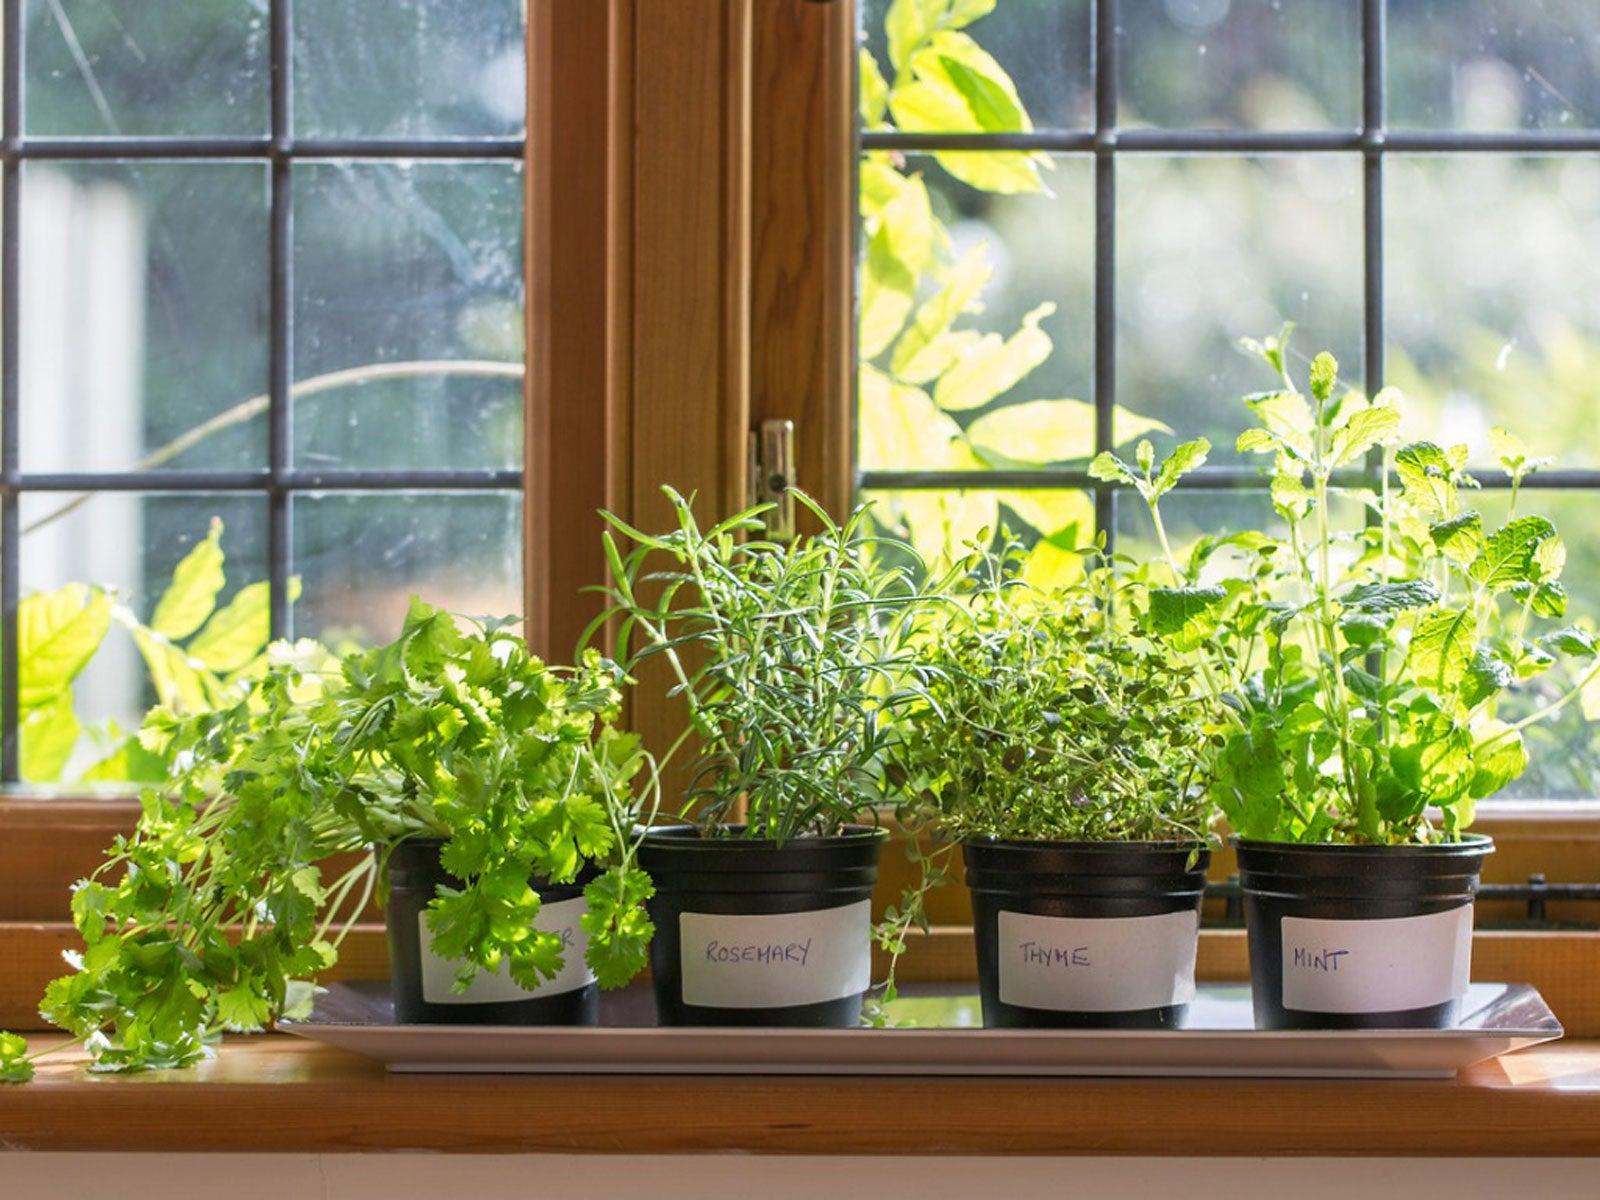 Growing Herbs Indoors How To Grow Herbs Indoors